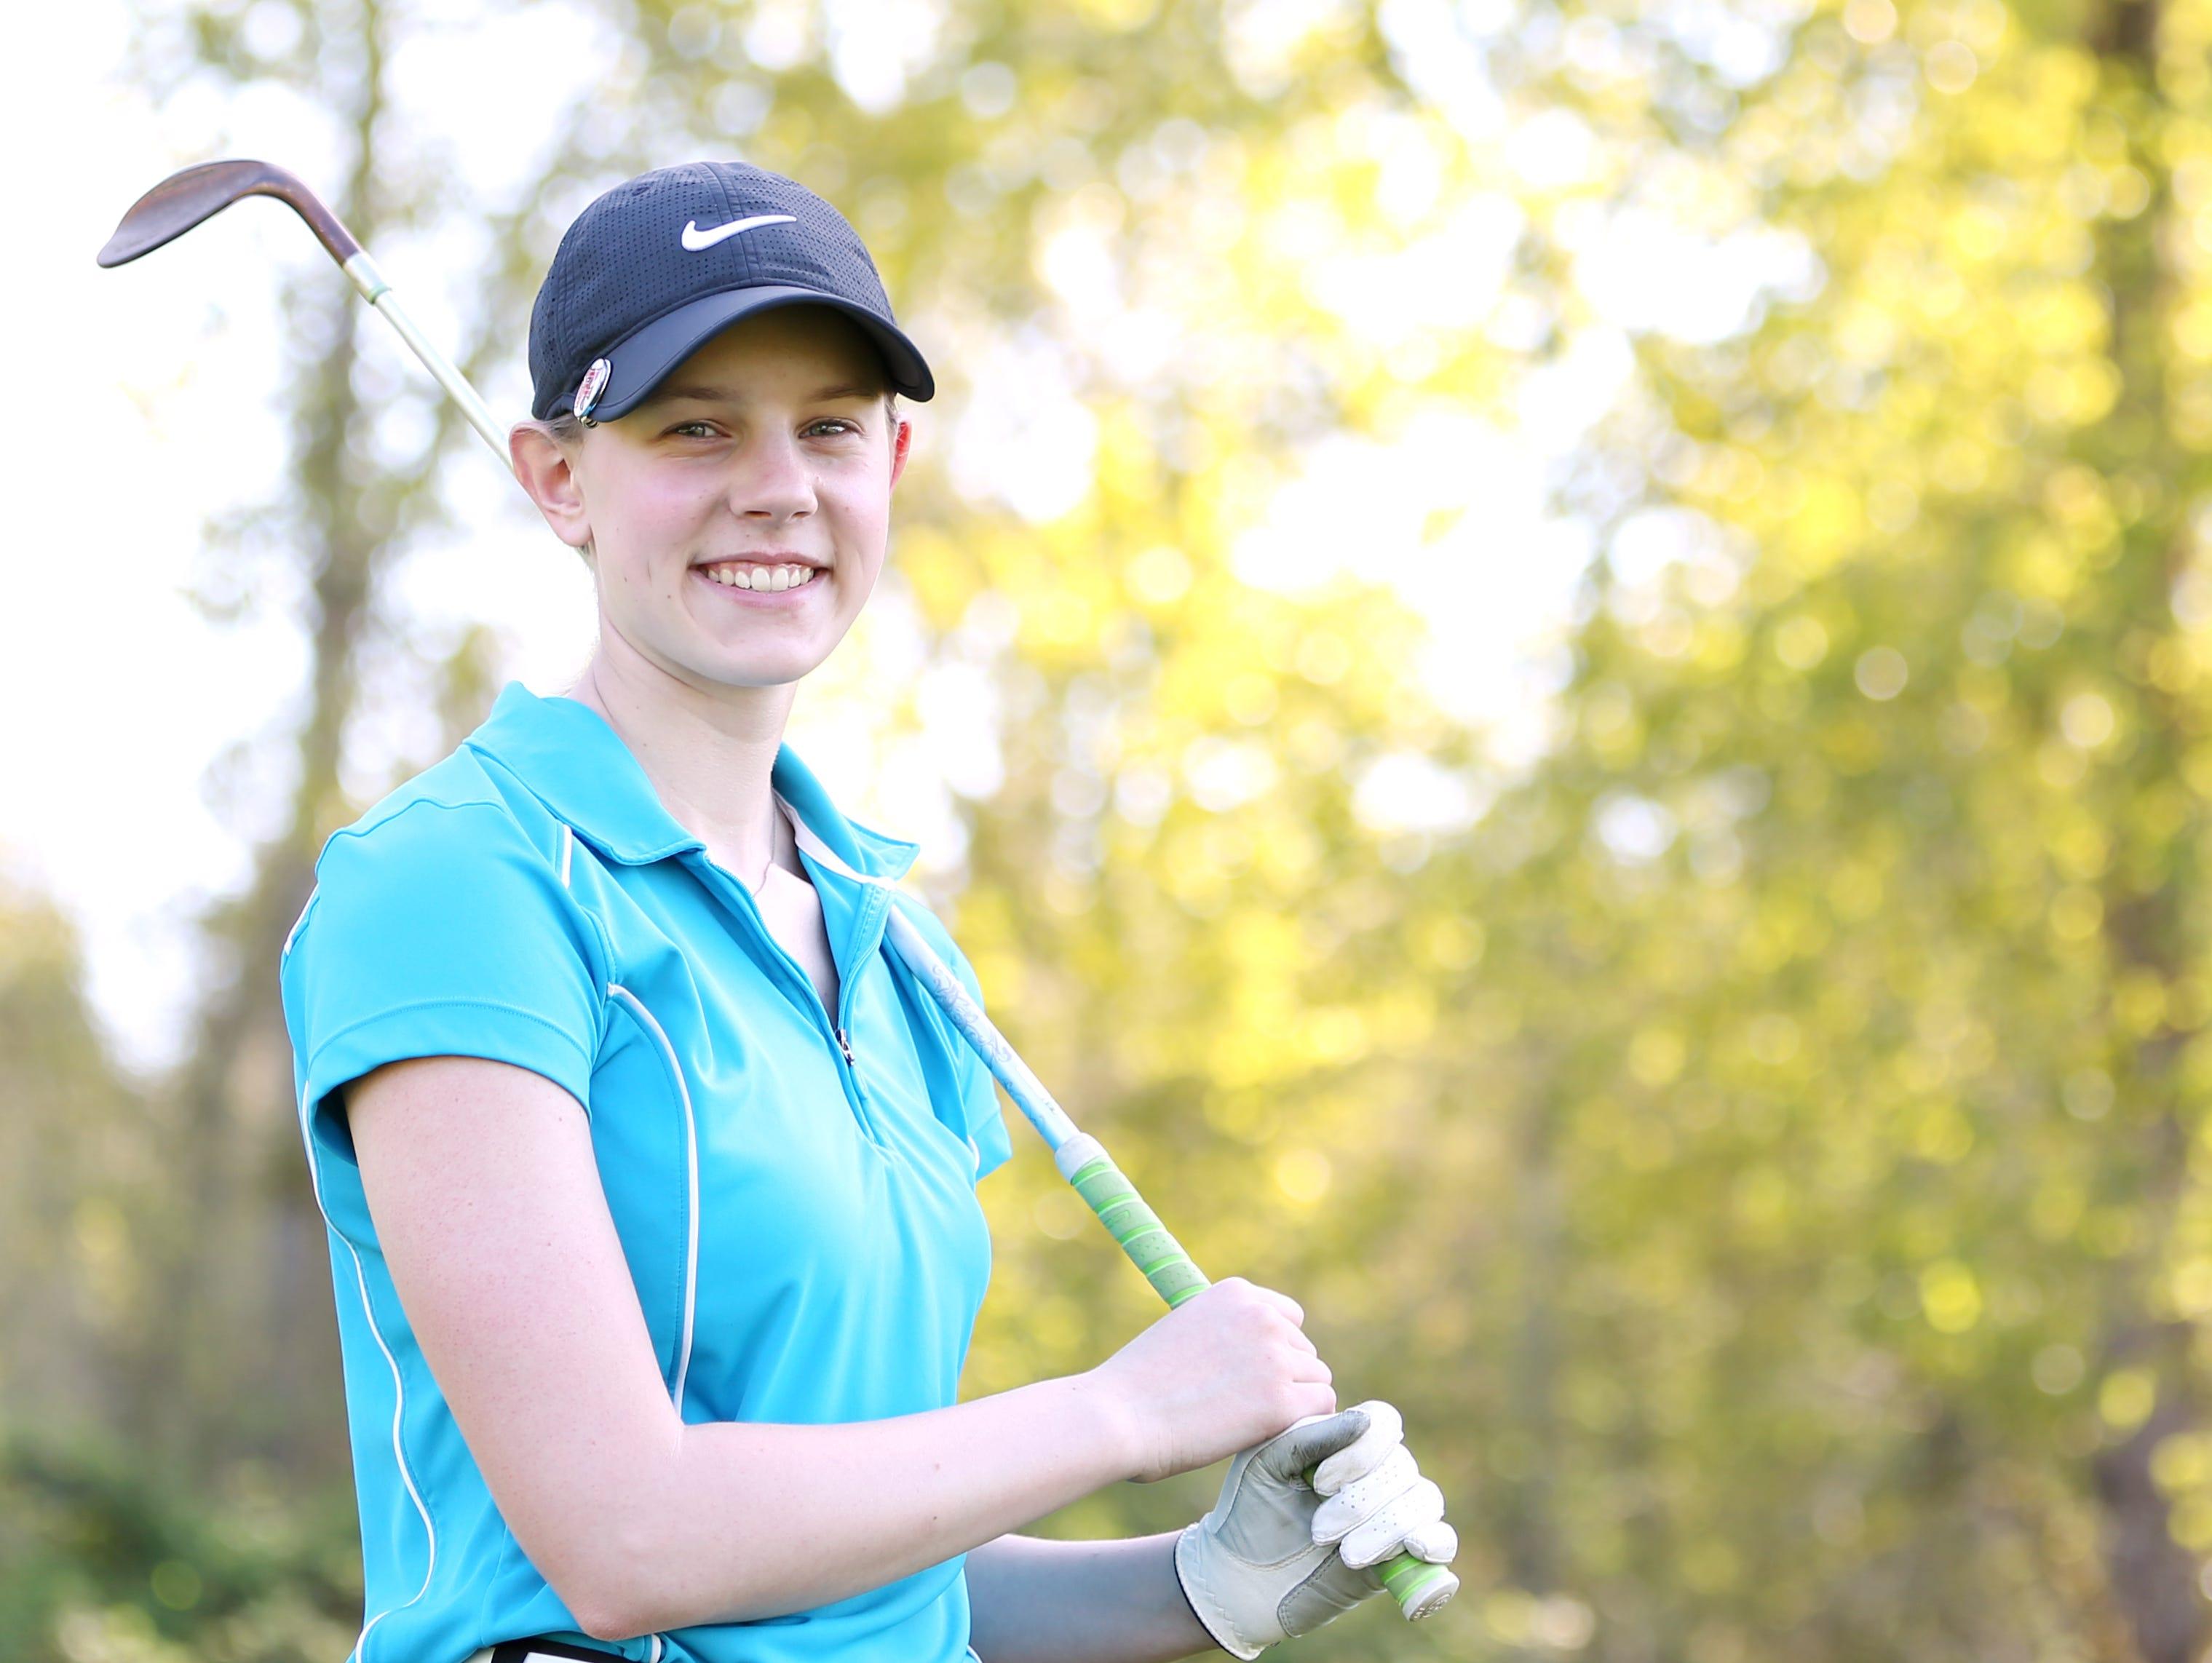 North Salem's Jessica Braun practices Thursday, March 31, 2016, at Salem Golf Club in South Salem.